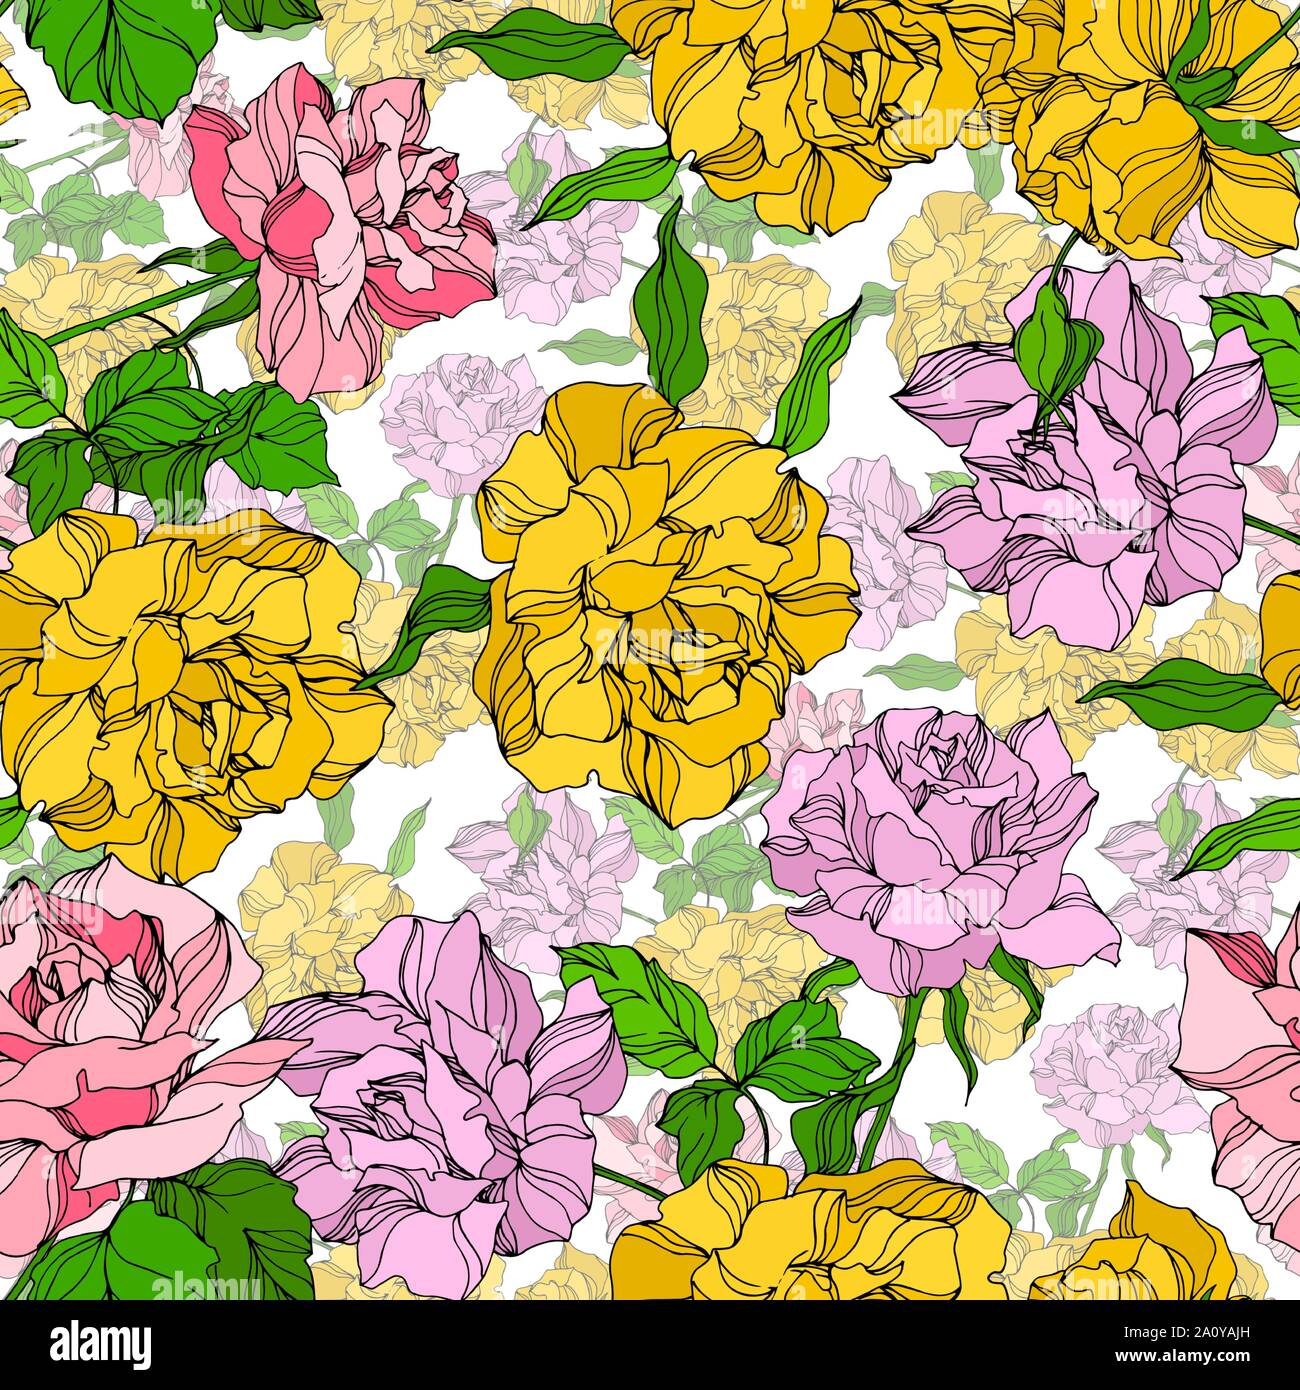 Vector Rose Floral Botanical Flowers Wild Spring Leaf Wildflower